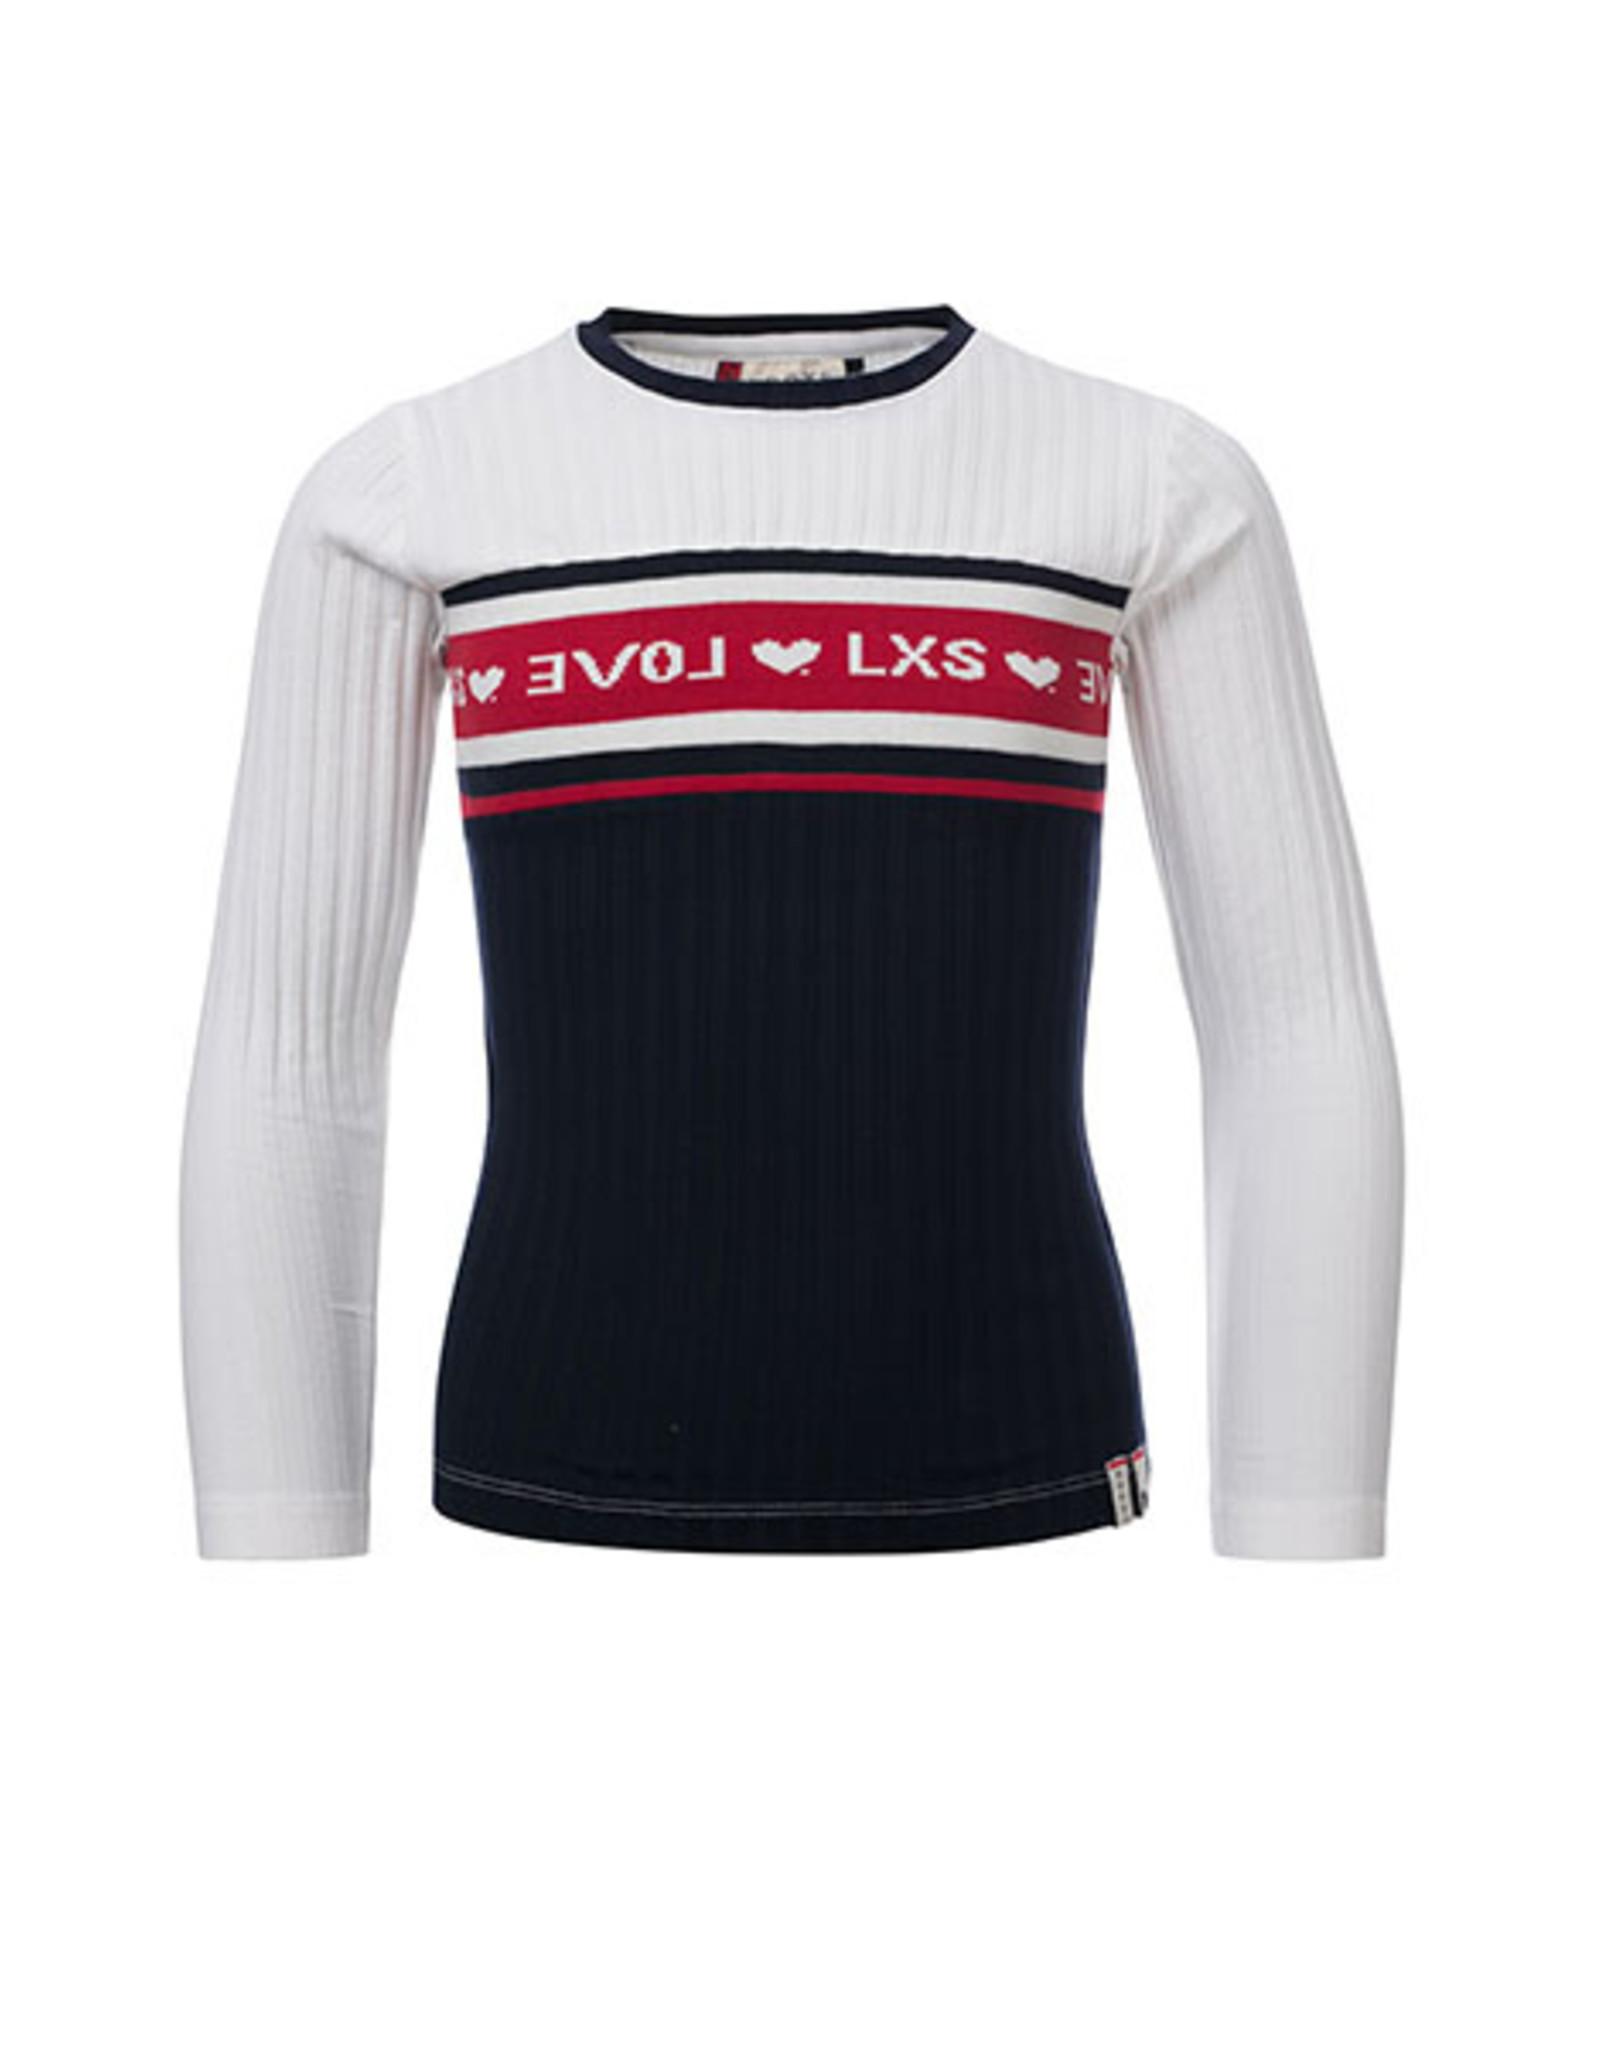 Looxs Revolution Girls Rib T-shirt with kn